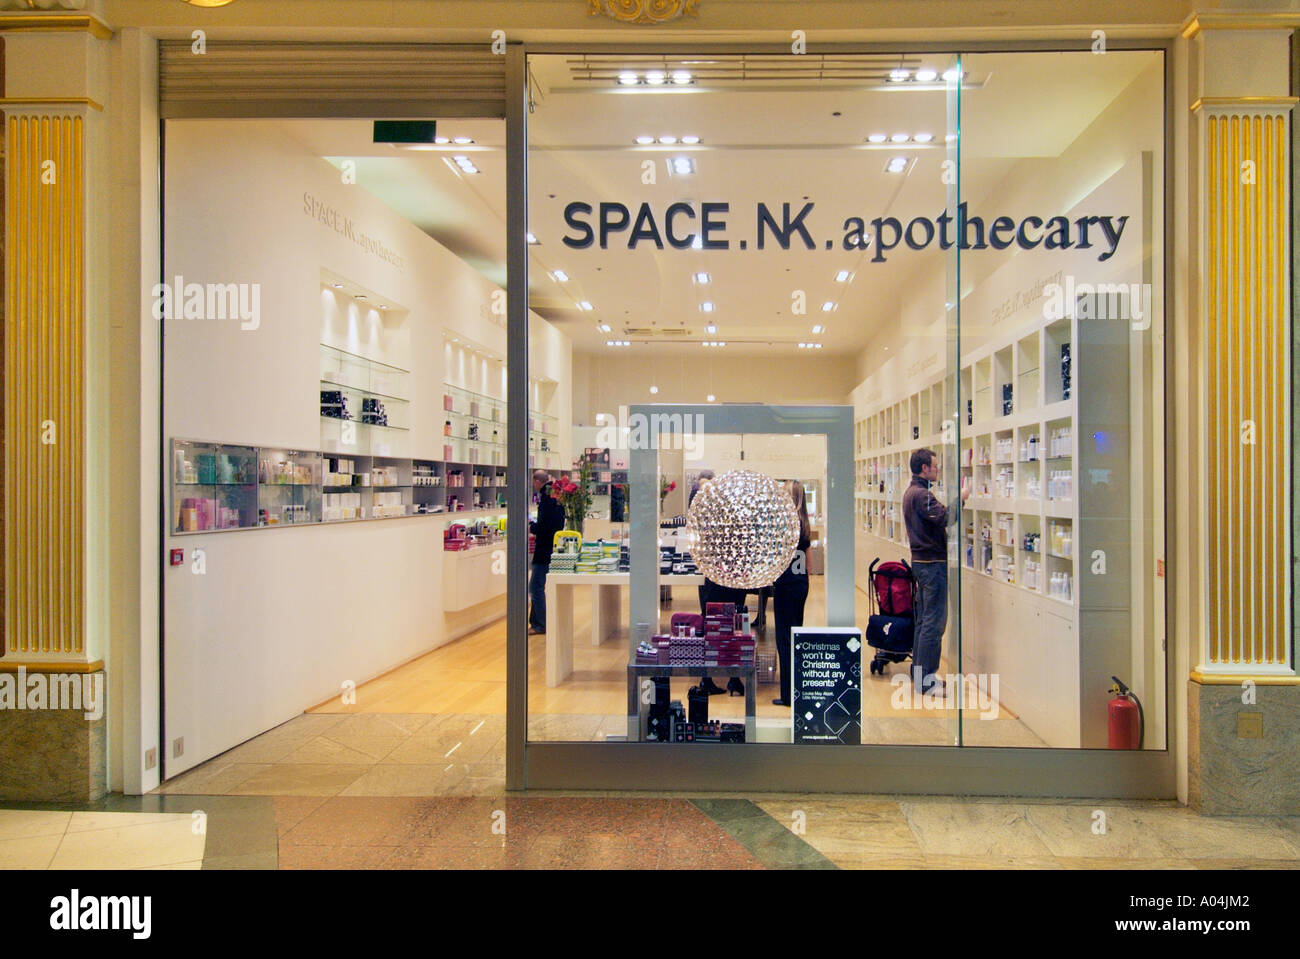 Space NK apothecary store retail store UK United Kingdom England Europe GB Great Britain EU European Union Stock Photo